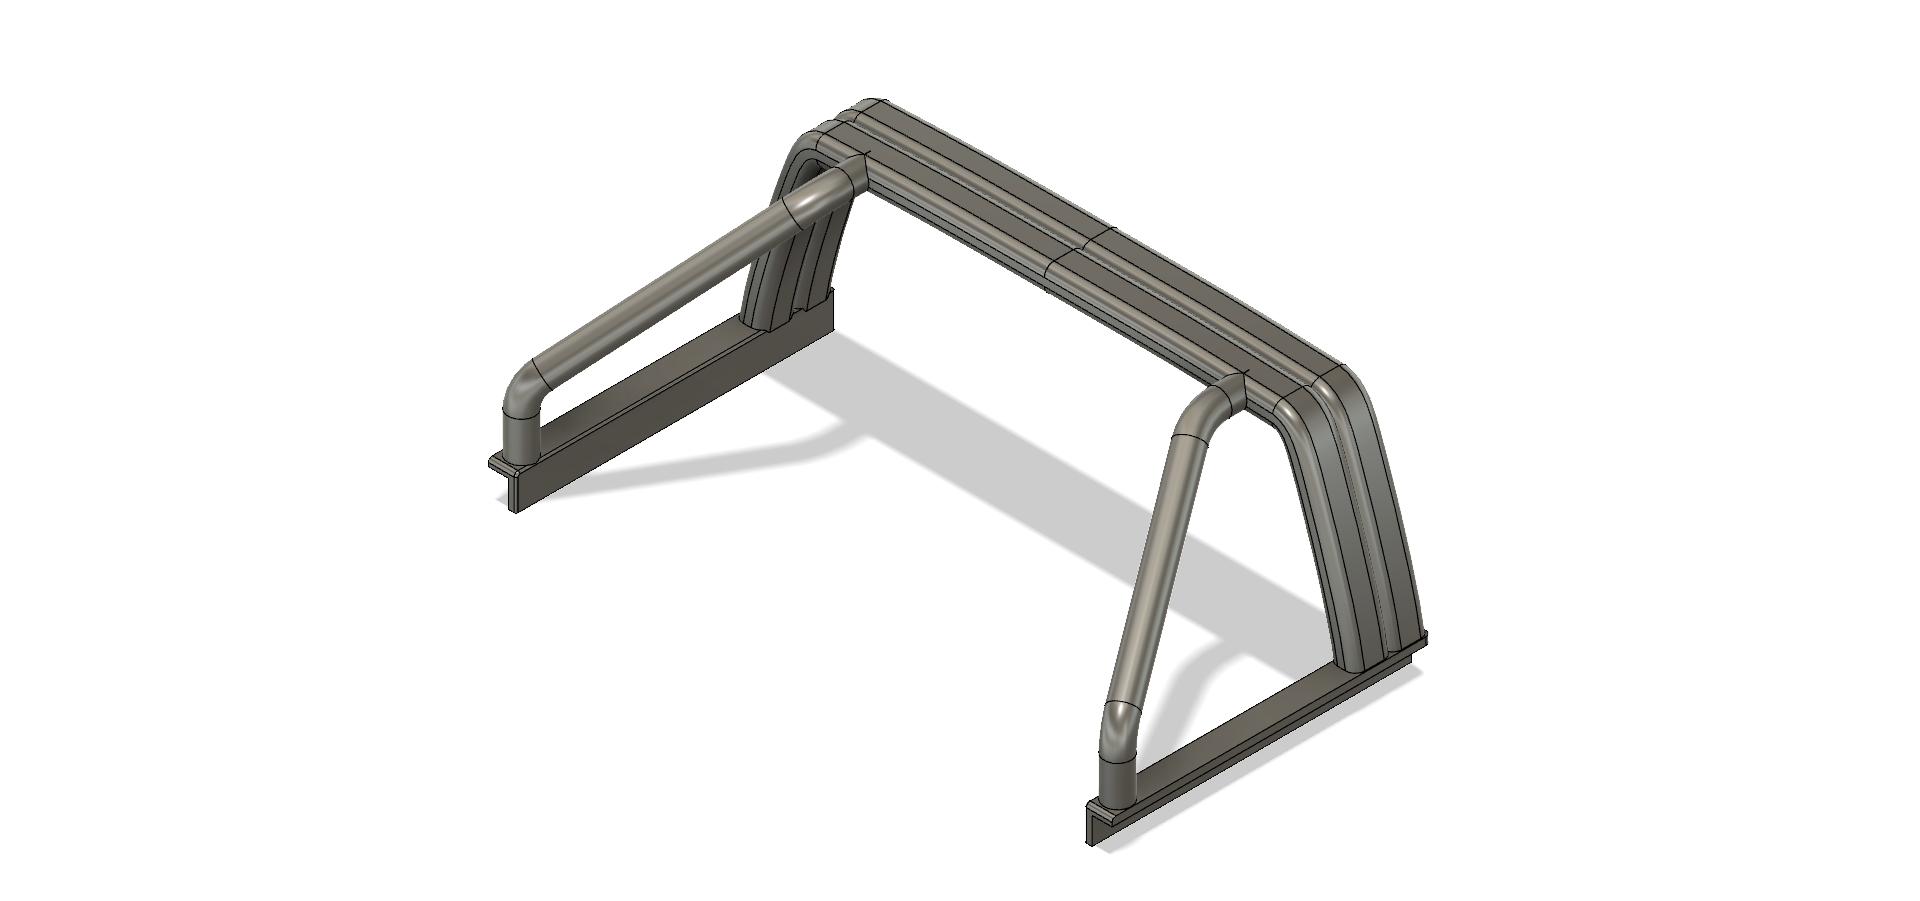 YOTA rool bar V2-2.png Download STL file TOYOTA HARD BODY SHELL ROOL BAR  • 3D printer design, kiatkla